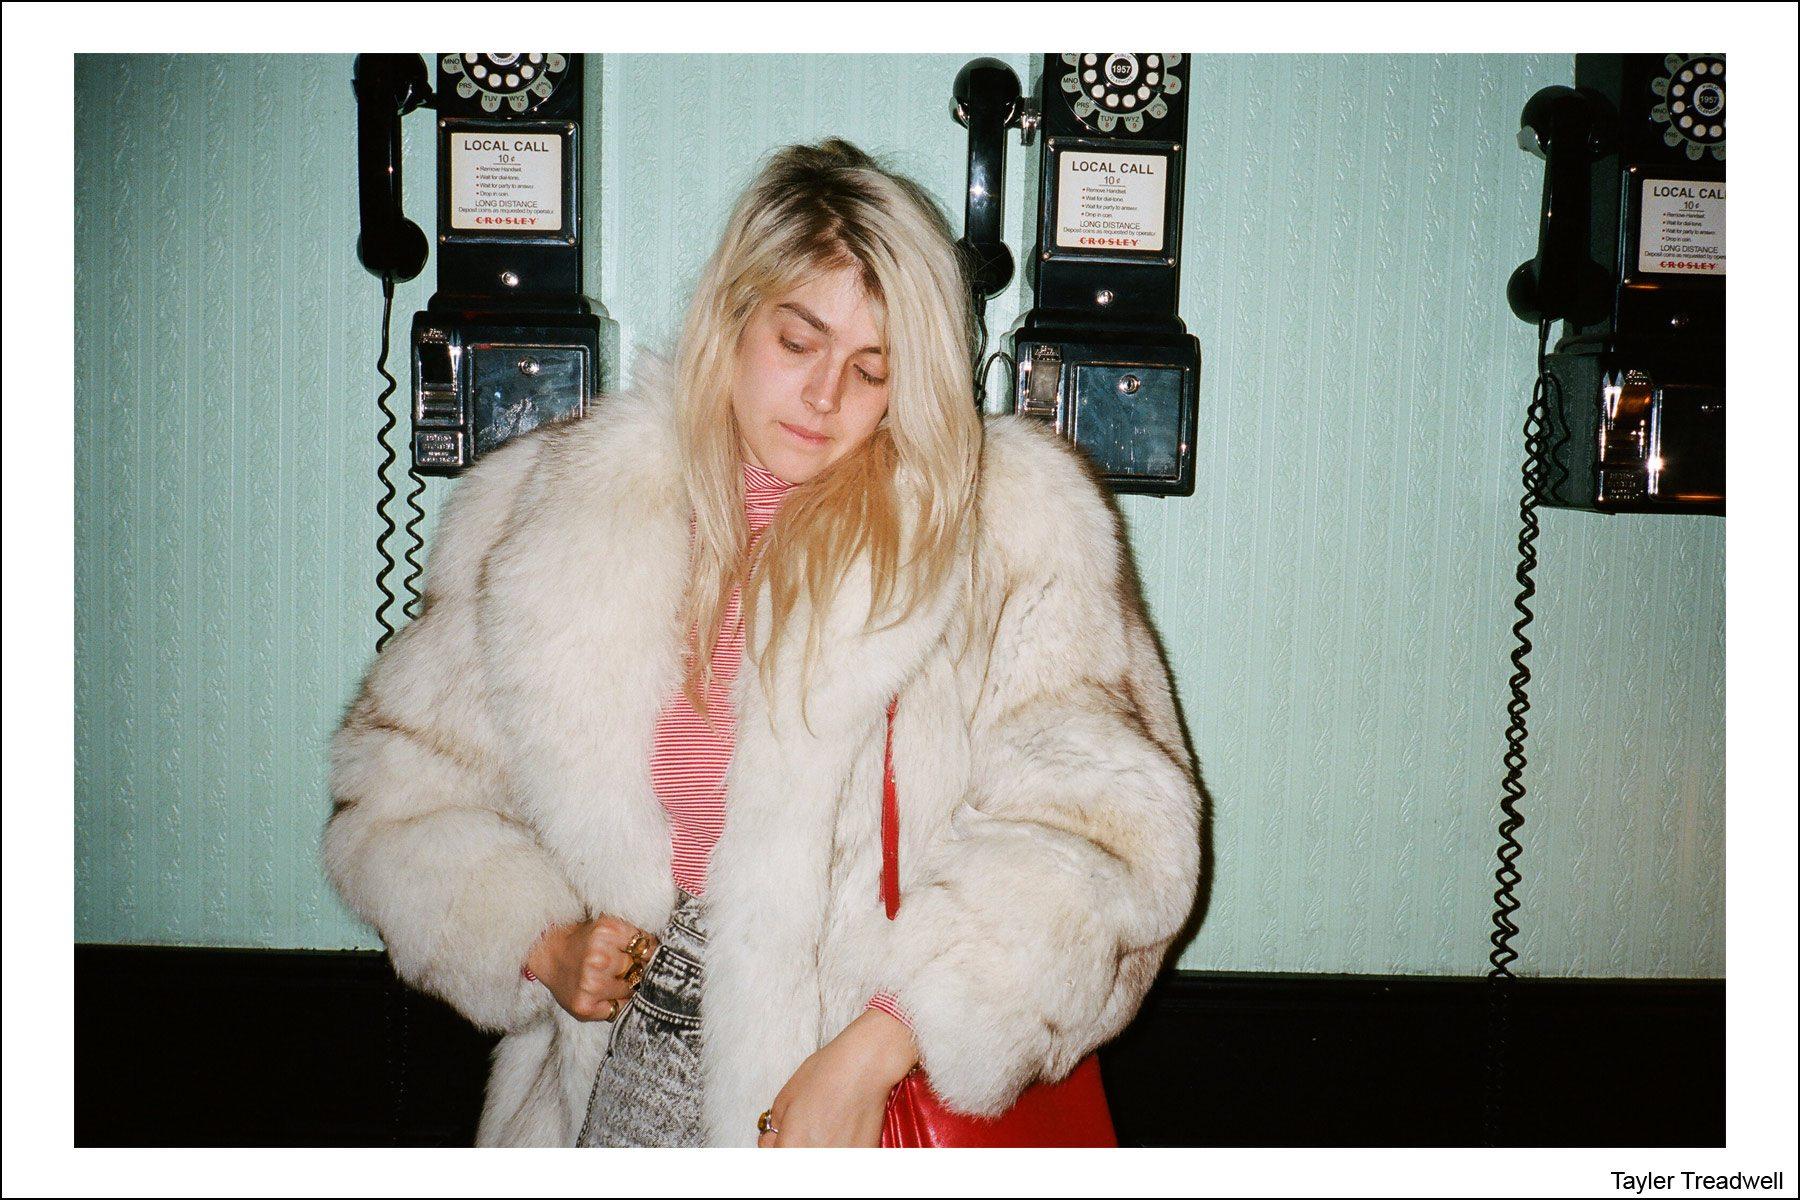 Taylor Treadwell photographed by Kristin Gallegos. Ponyboy magazine NY.